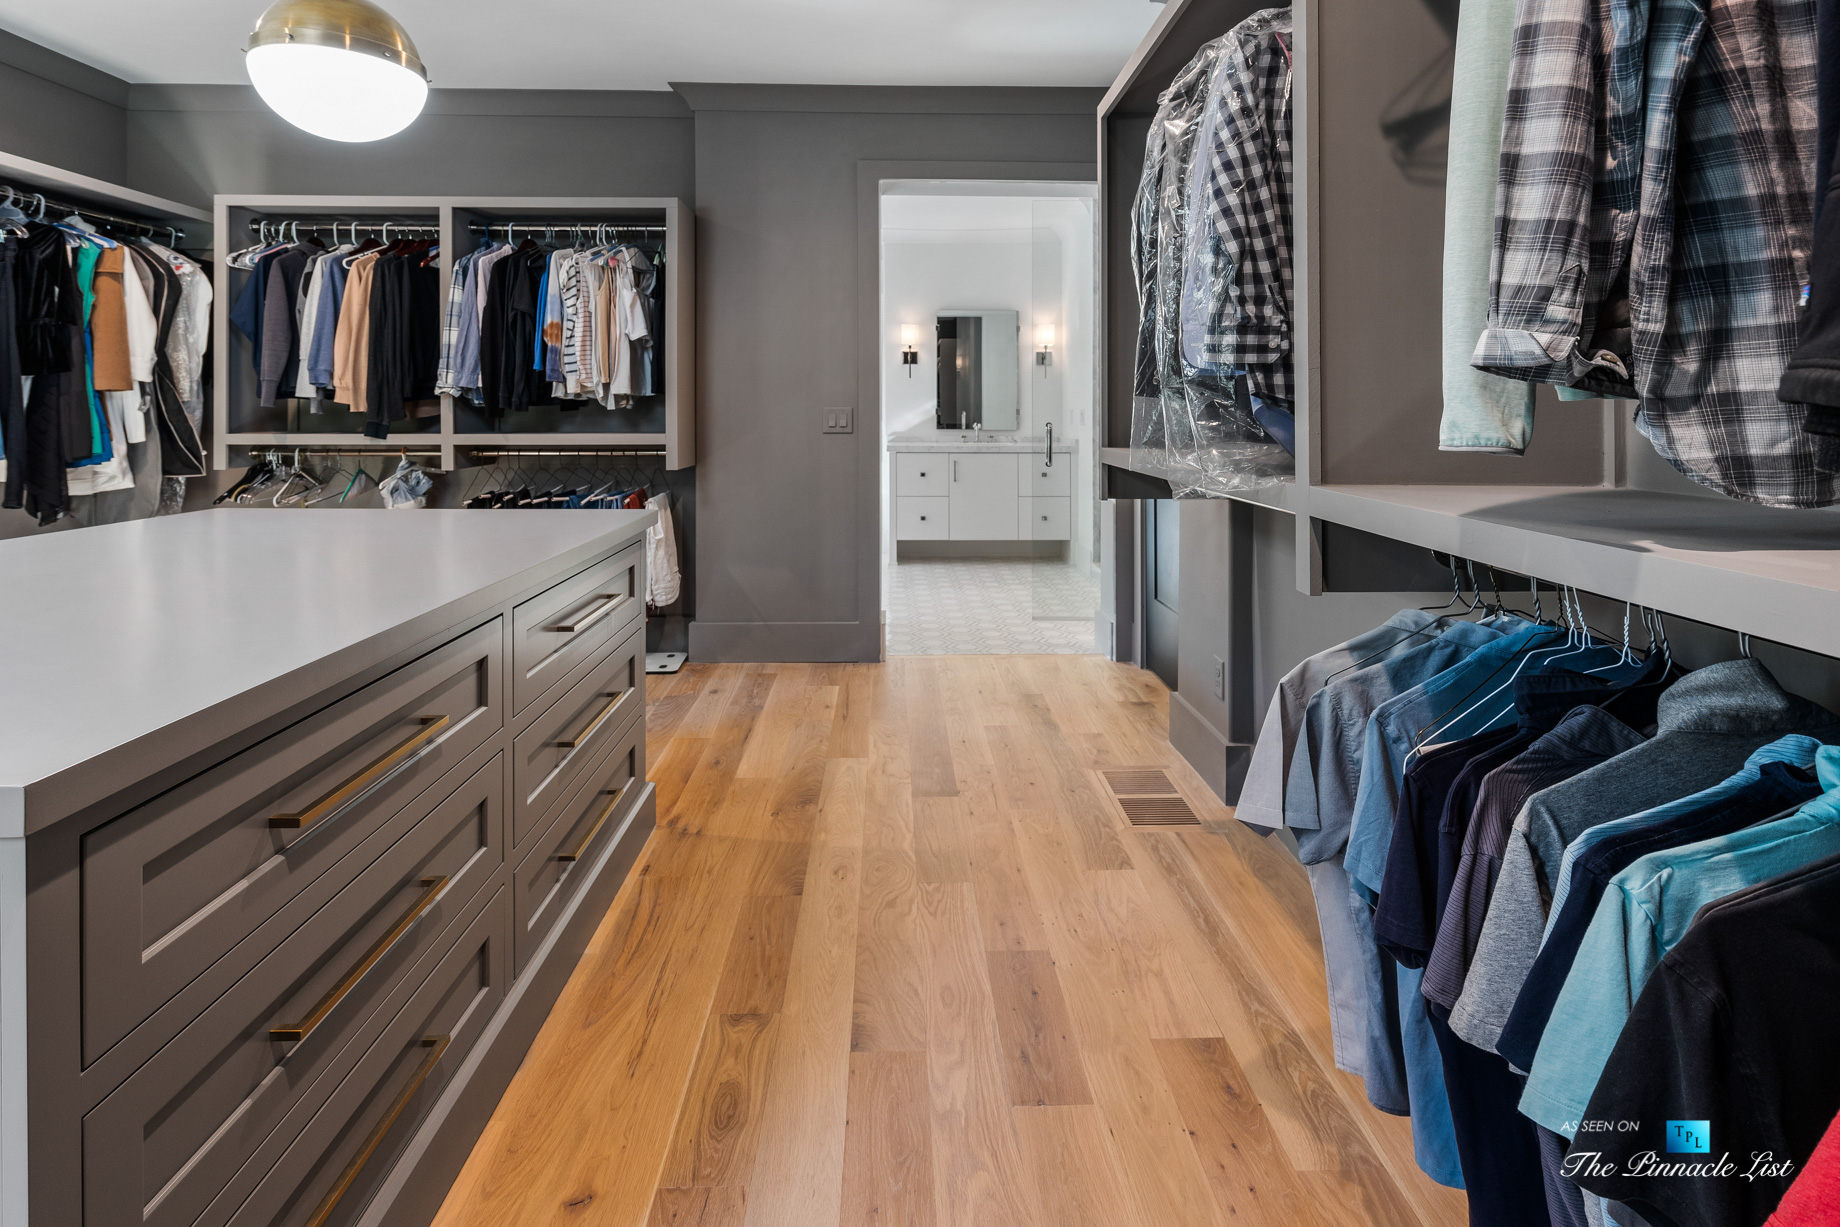 447 Valley Rd NW, Atlanta, GA, USA – Master Bedroom Walk In Closet Room – Luxury Real Estate – Tuxedo Park Home